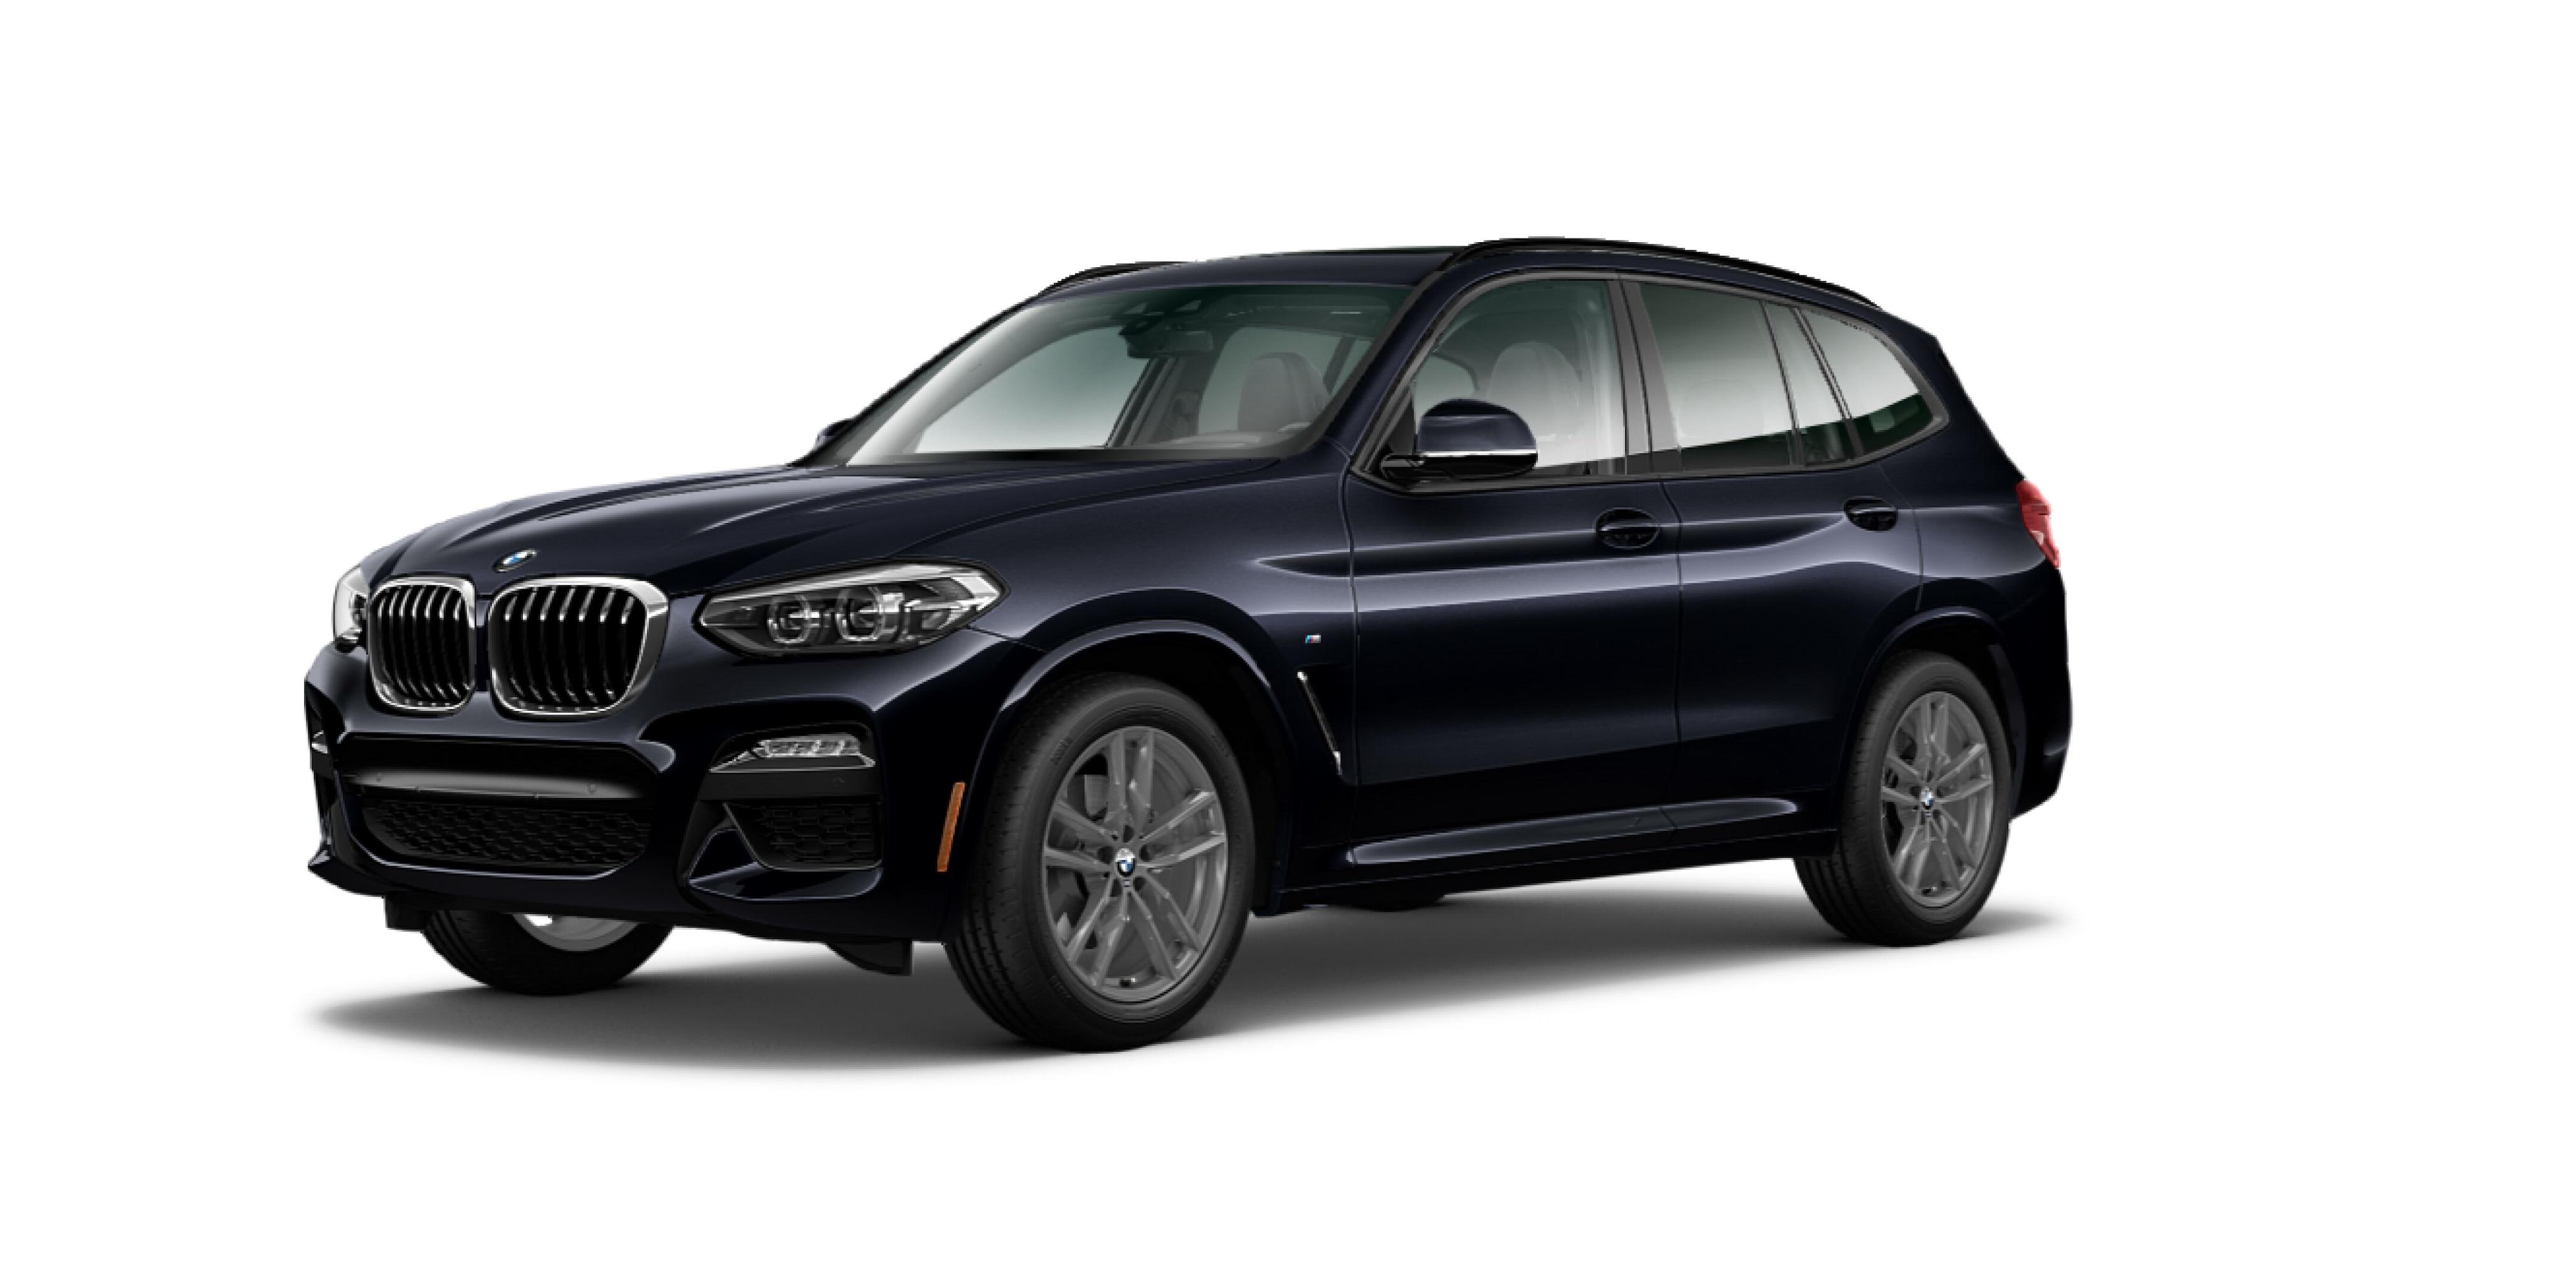 2019 BMW X3 xDrive30i SAV Plattsburgh, NY